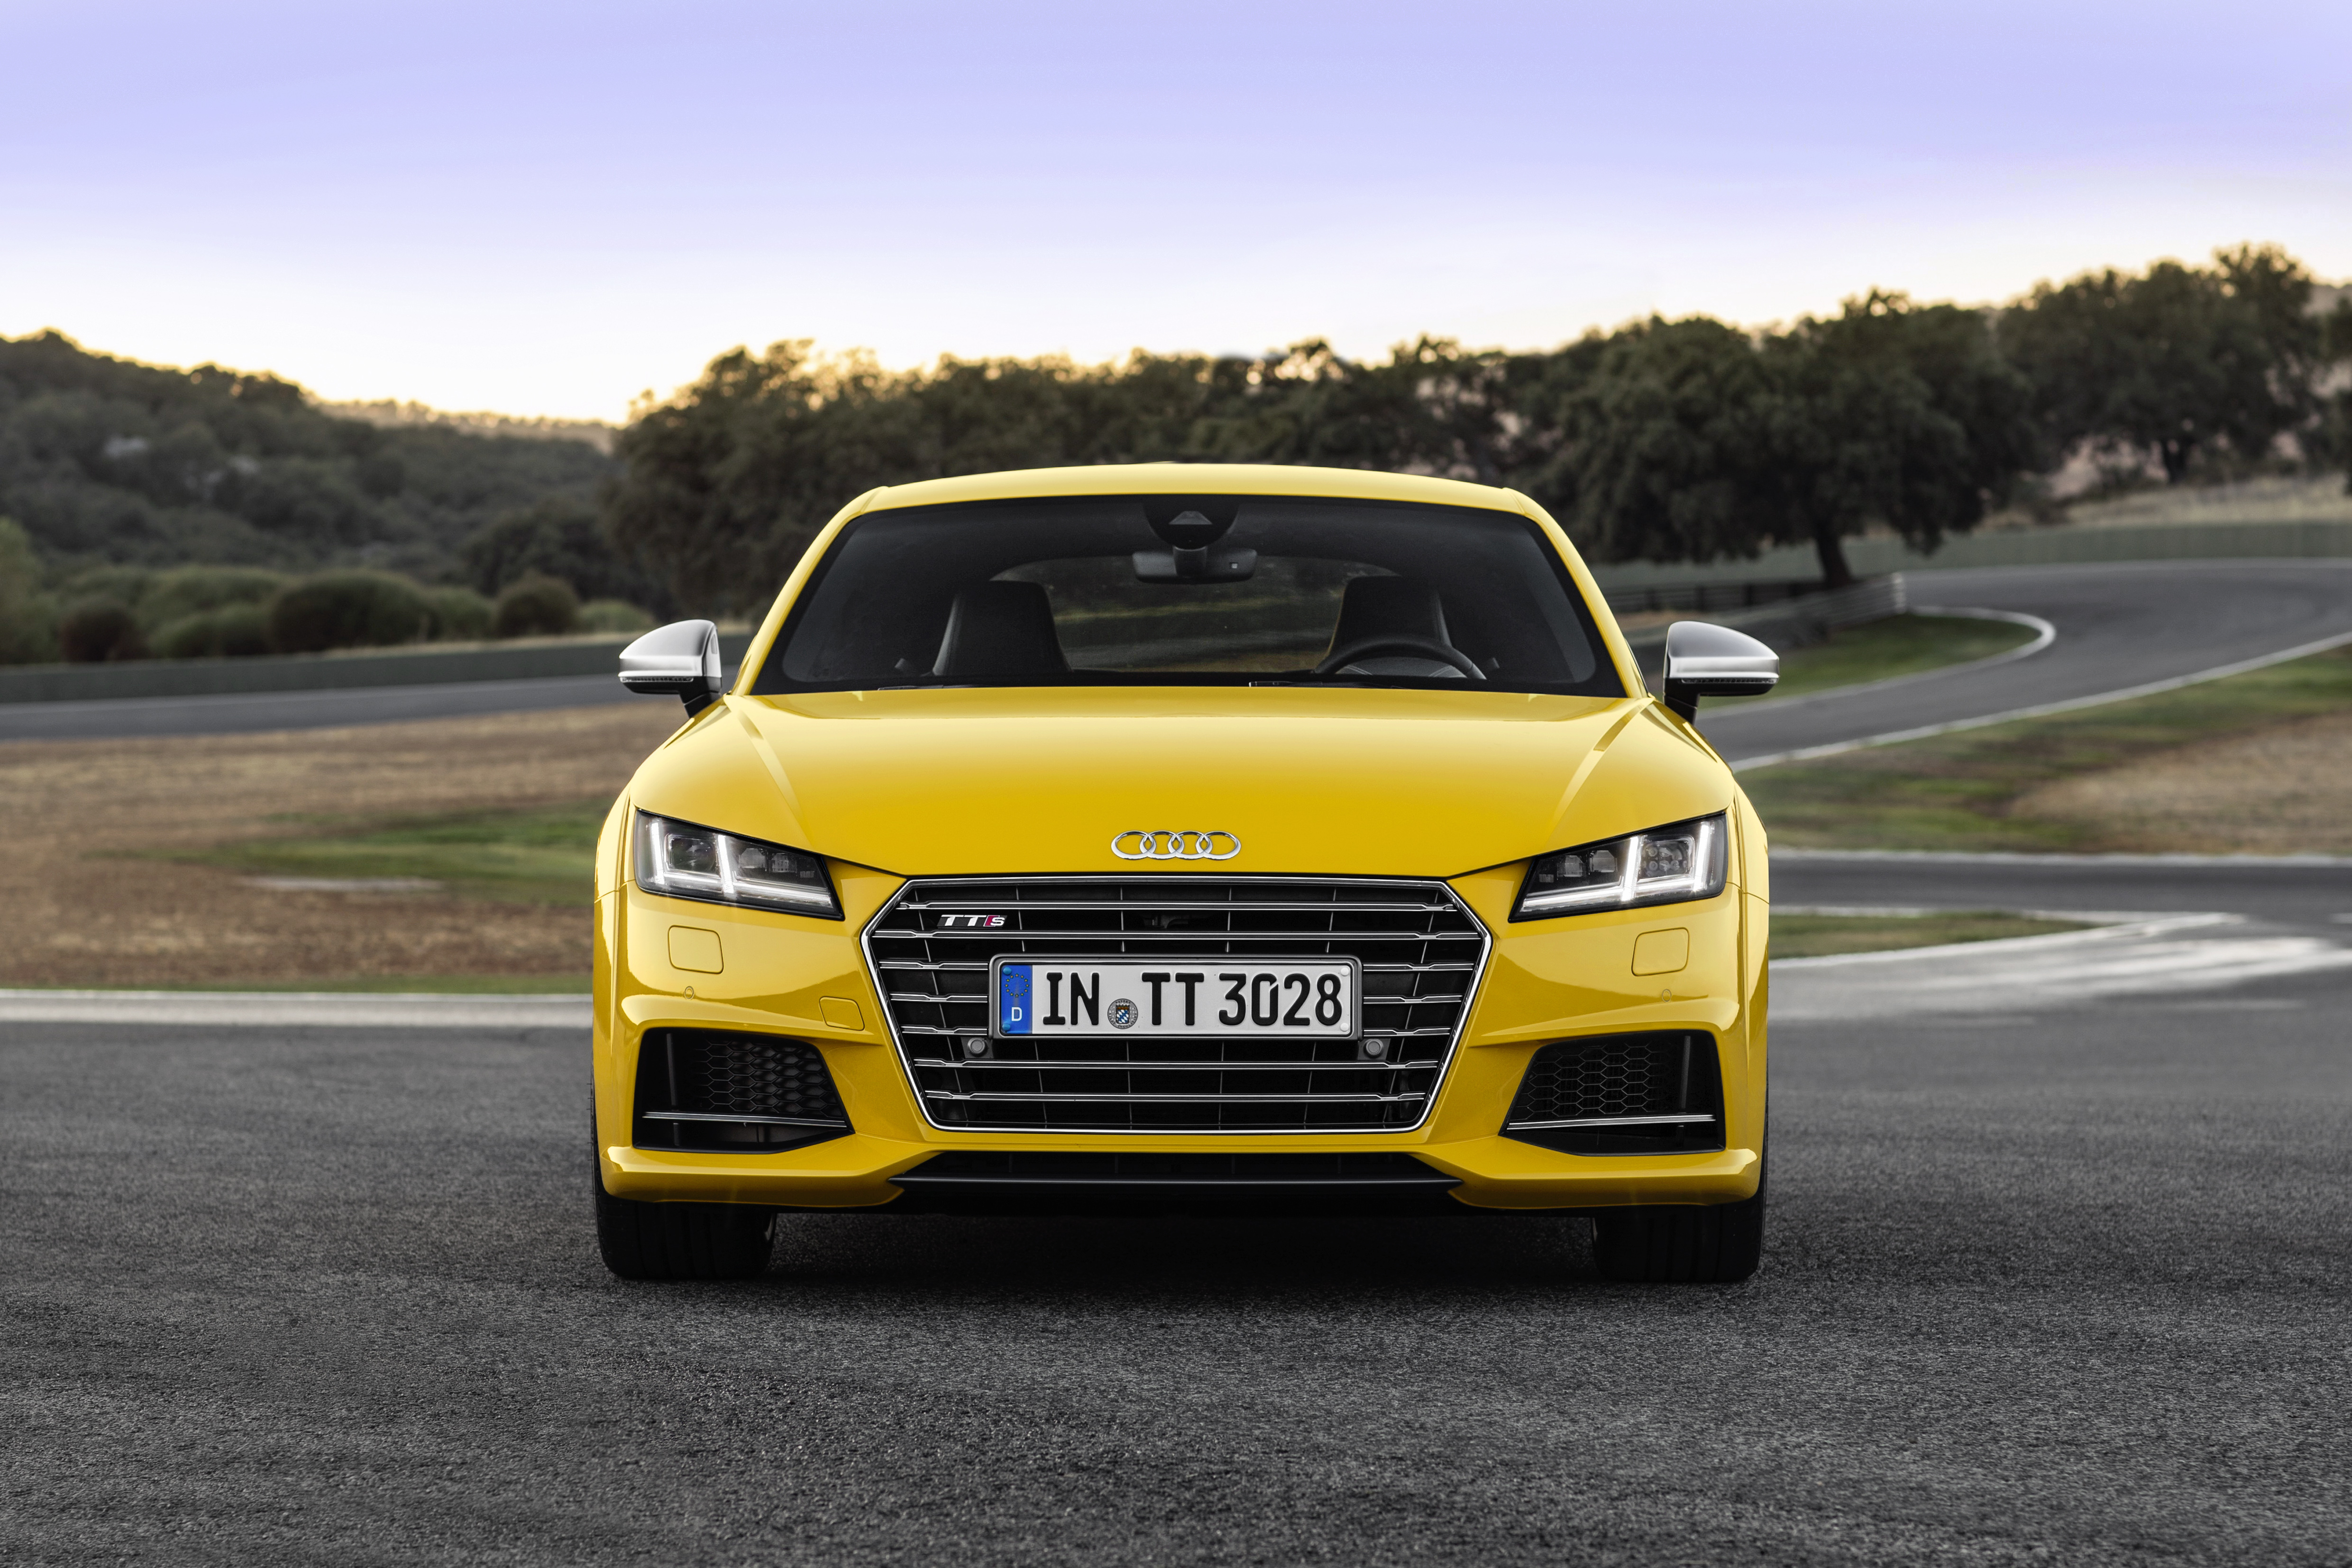 New Audi Tt Tts Coupe Photos Show Vegas Yellow And Tango Red